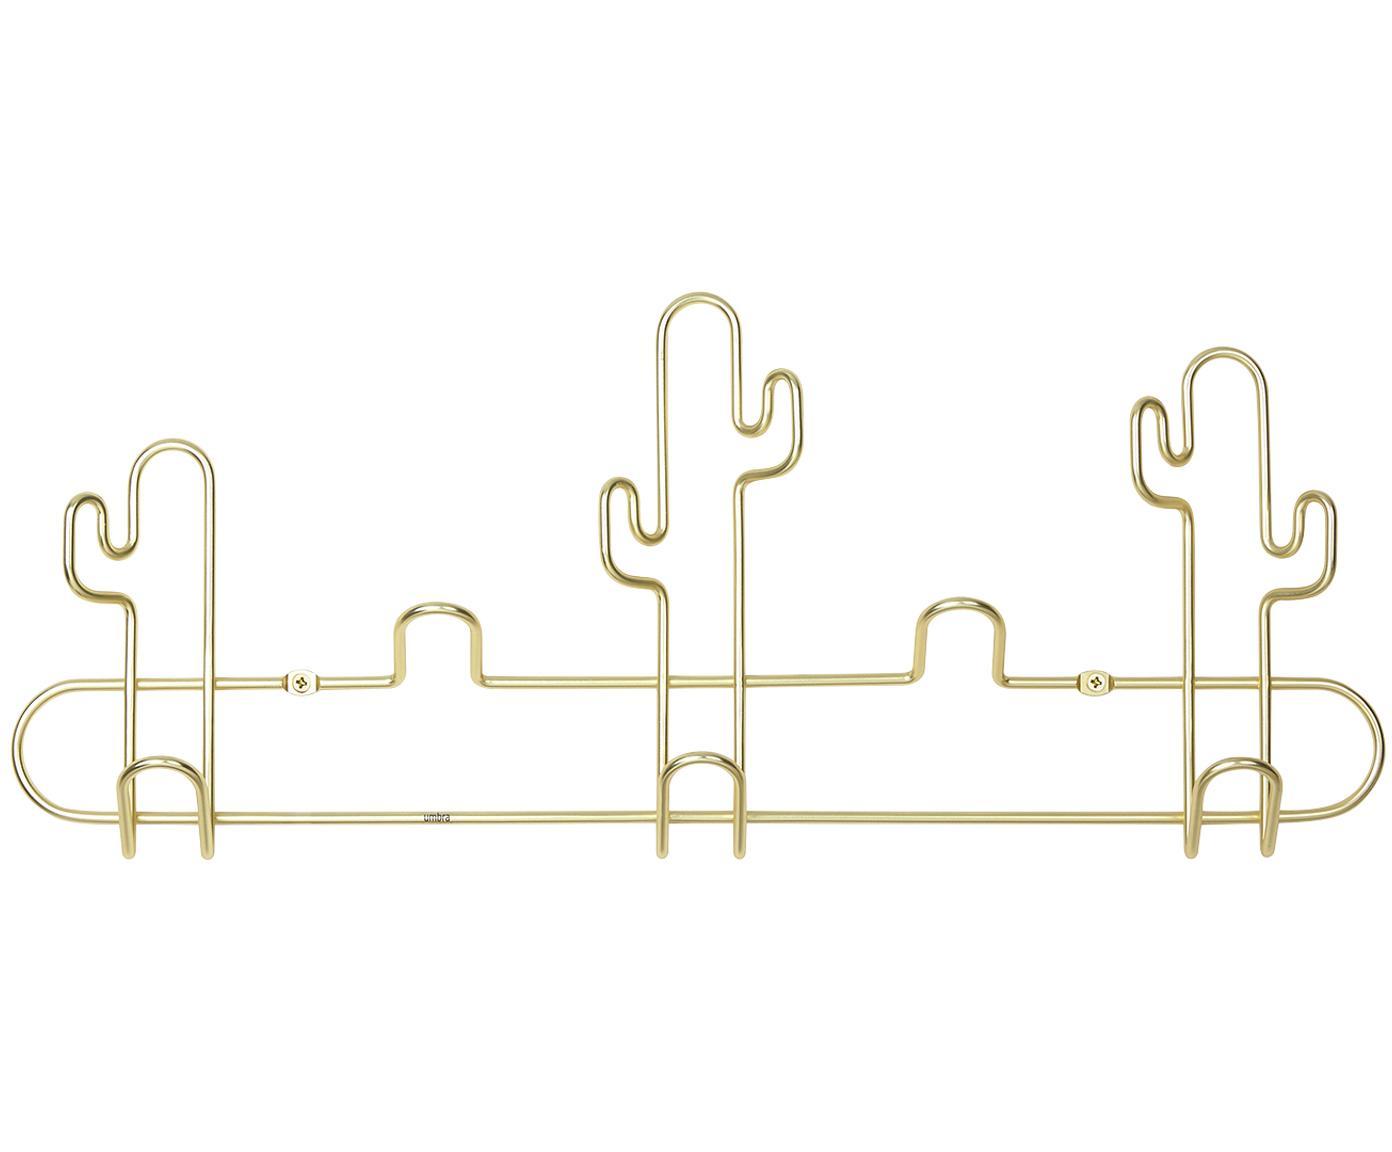 Metall-Wandgarderobe Desert in Goldfarben, Metall, lackiert, Messingfarben, 43 x 18 cm